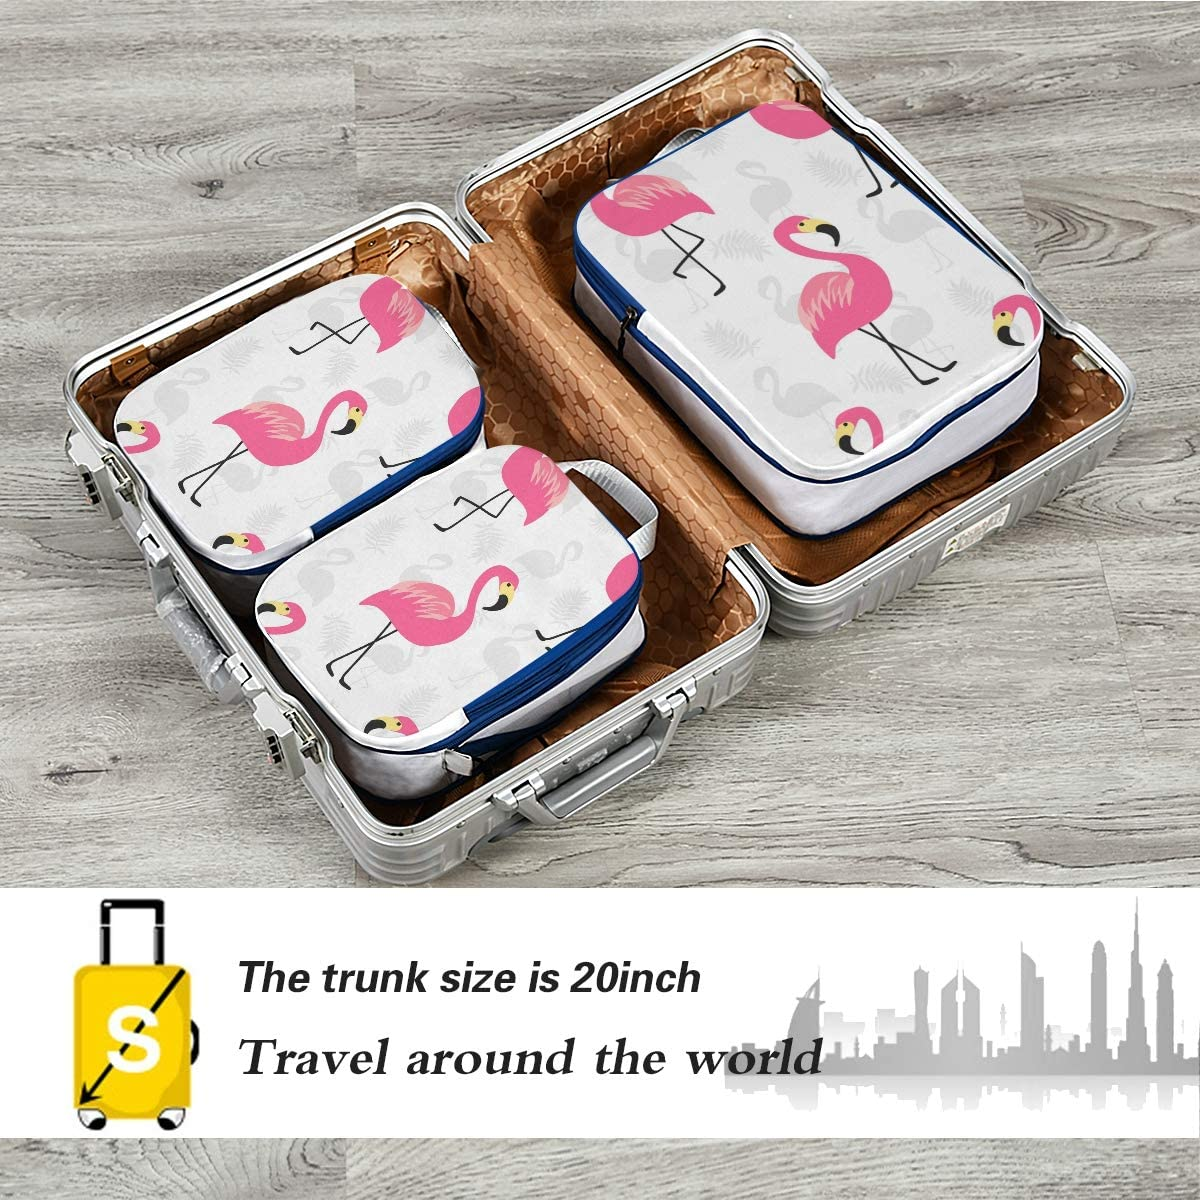 o Beautiful Pink Flamingo 3 Set Packing Cubes,2 Various Sizes Travel Luggage Packing Organizers